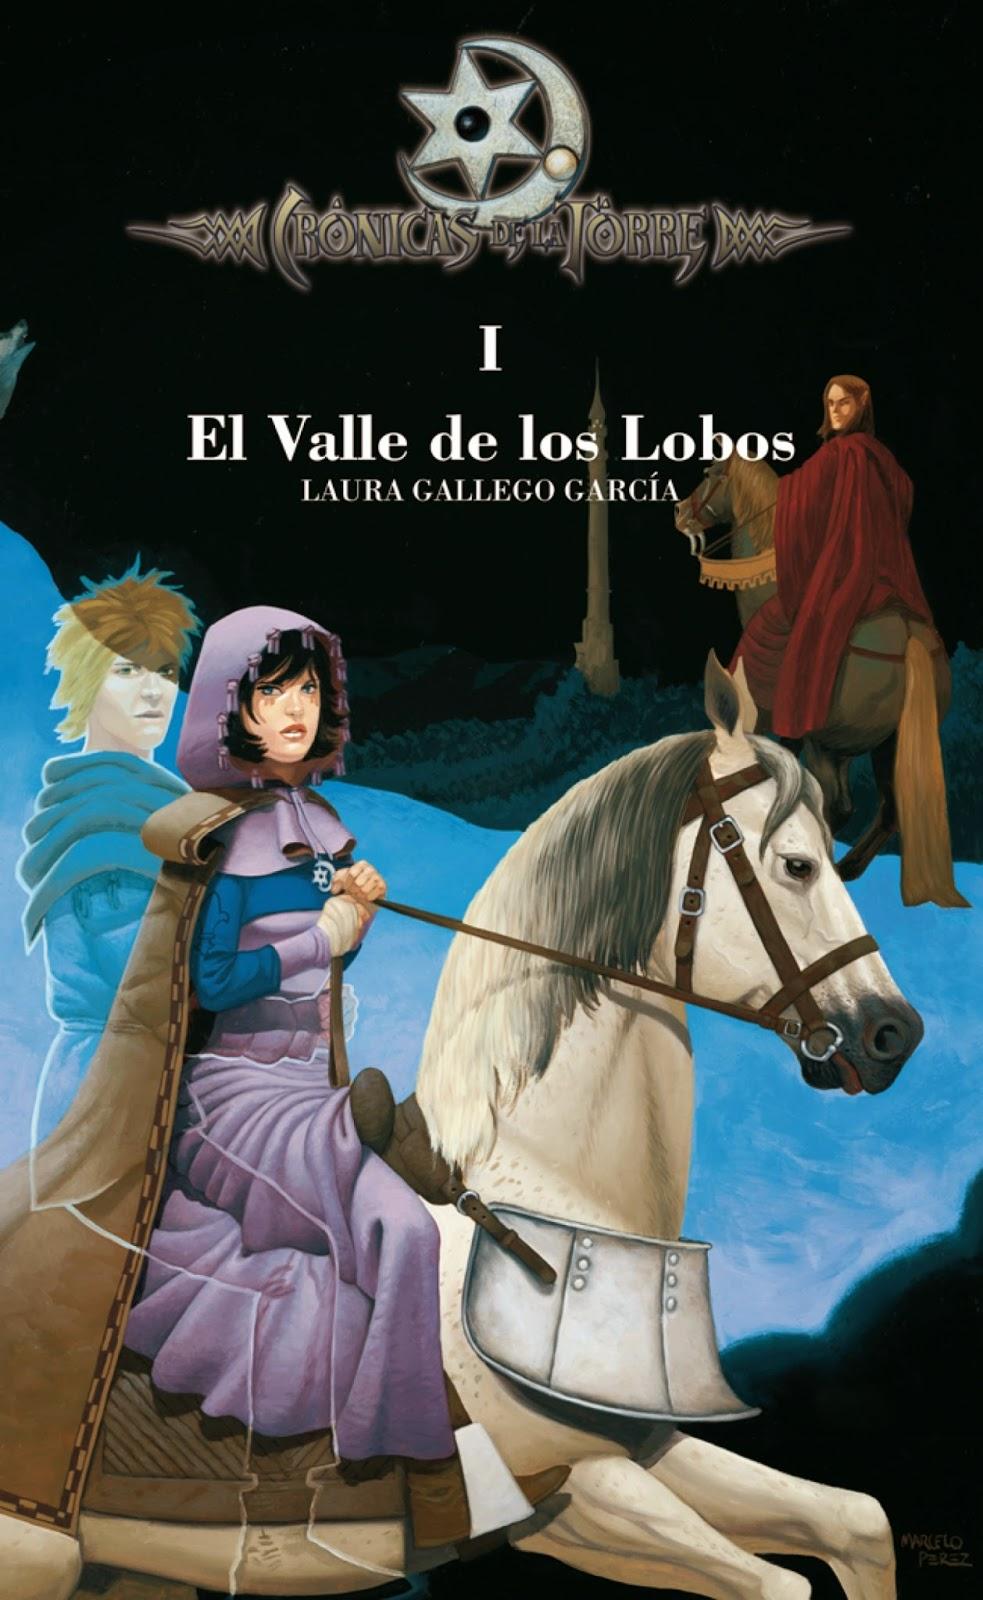 It's Books Time: Reseñas Trilogía: Crónicas de la Torre de